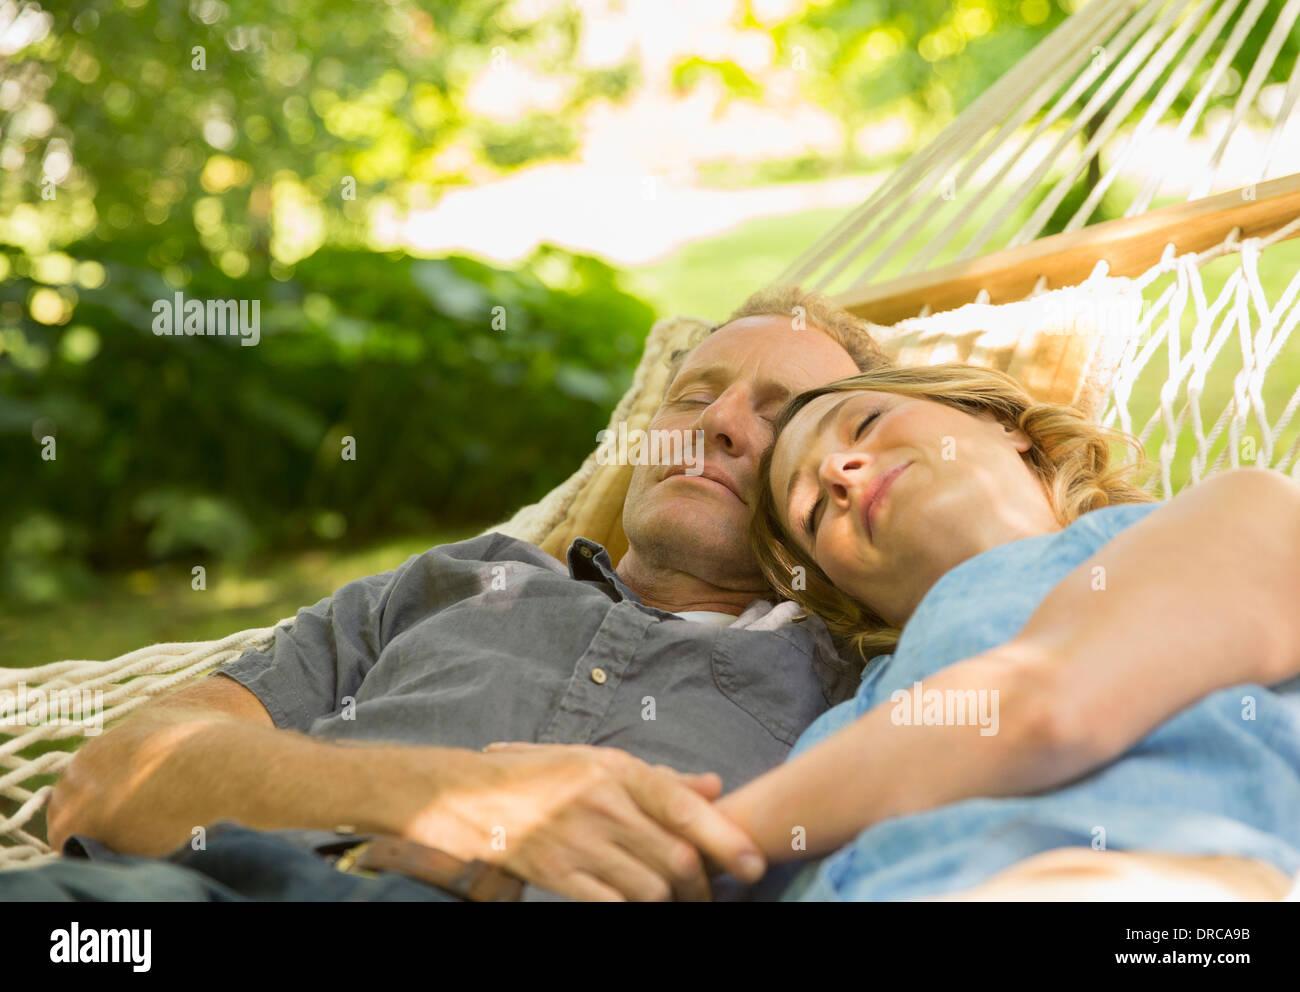 Couple sleeping in hammock - Stock Image